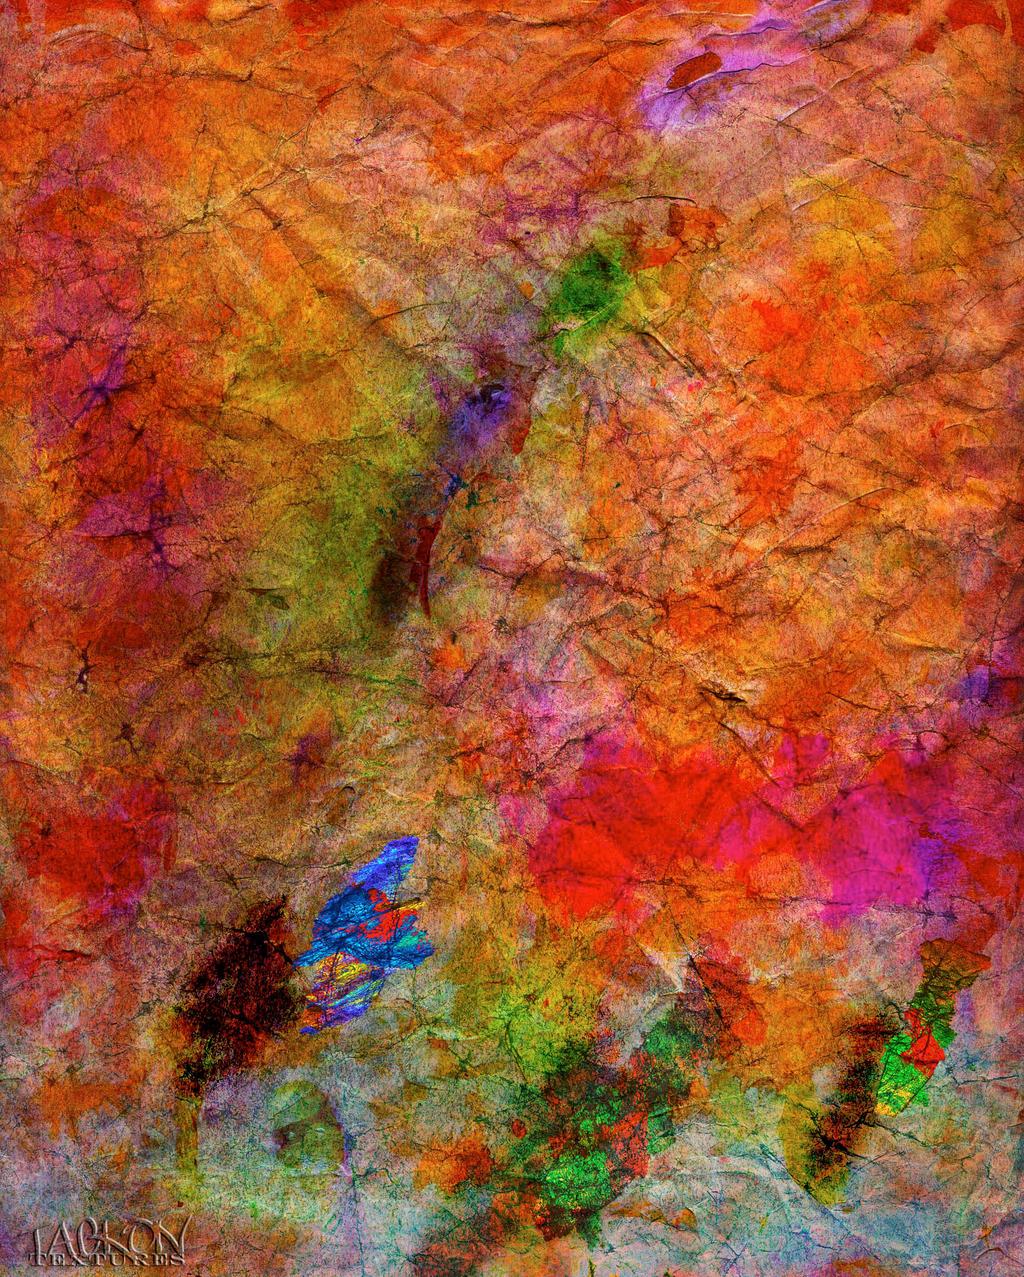 Colour Creation 188 by Tackon